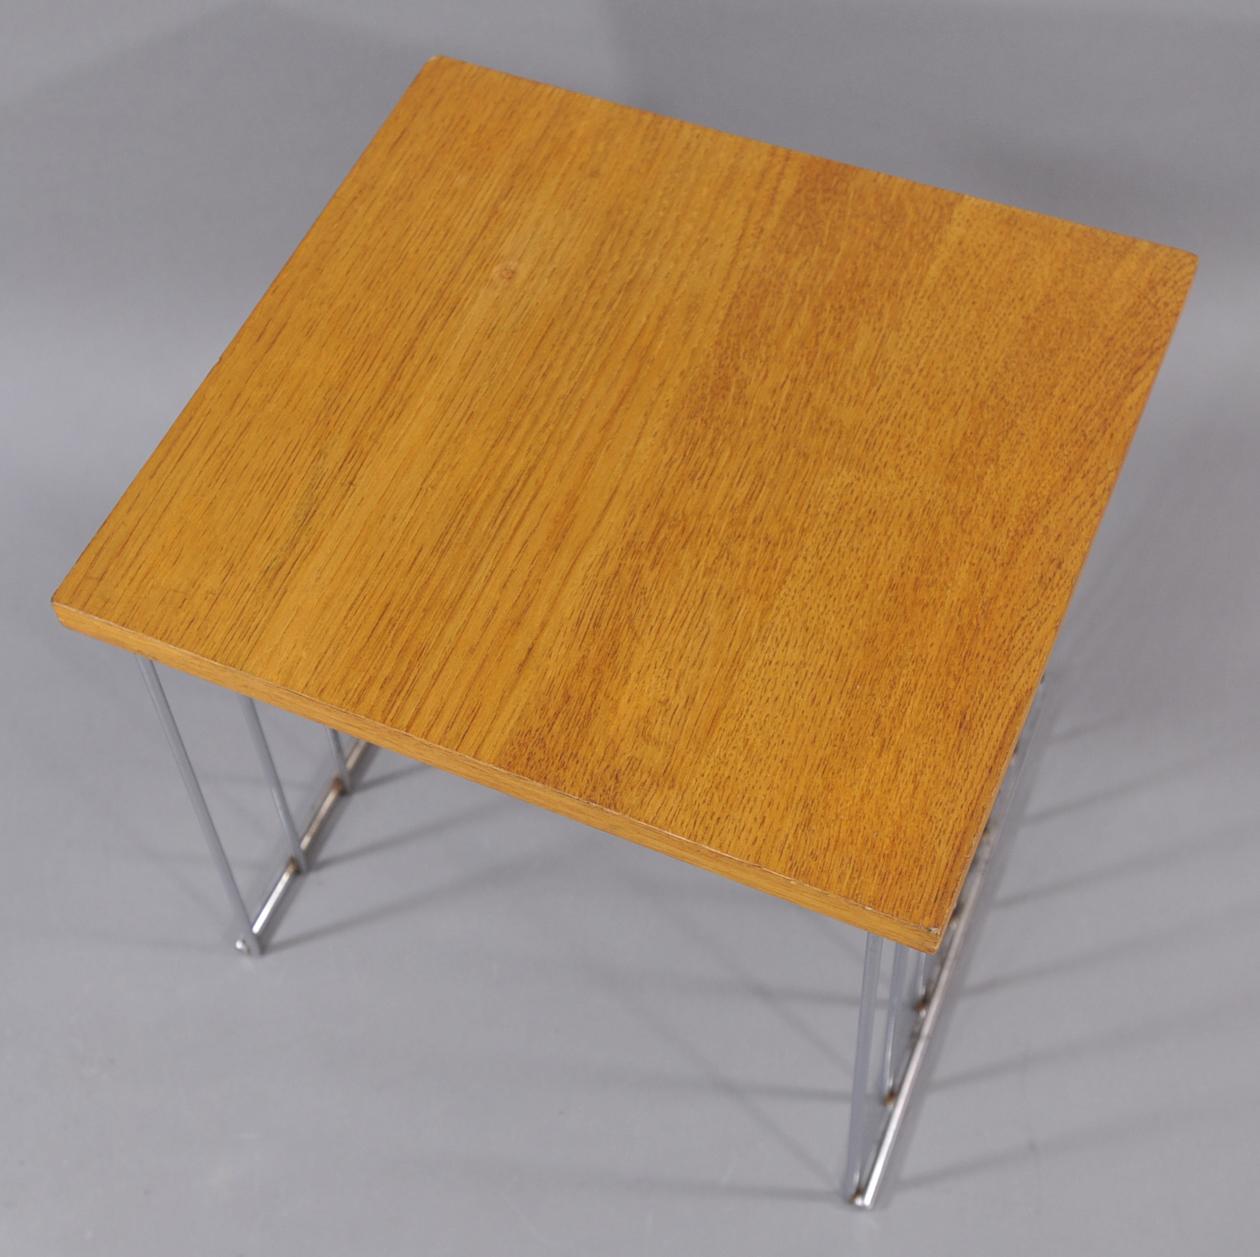 tabouret tulip type eero saarinen knoll modulolab. Black Bedroom Furniture Sets. Home Design Ideas